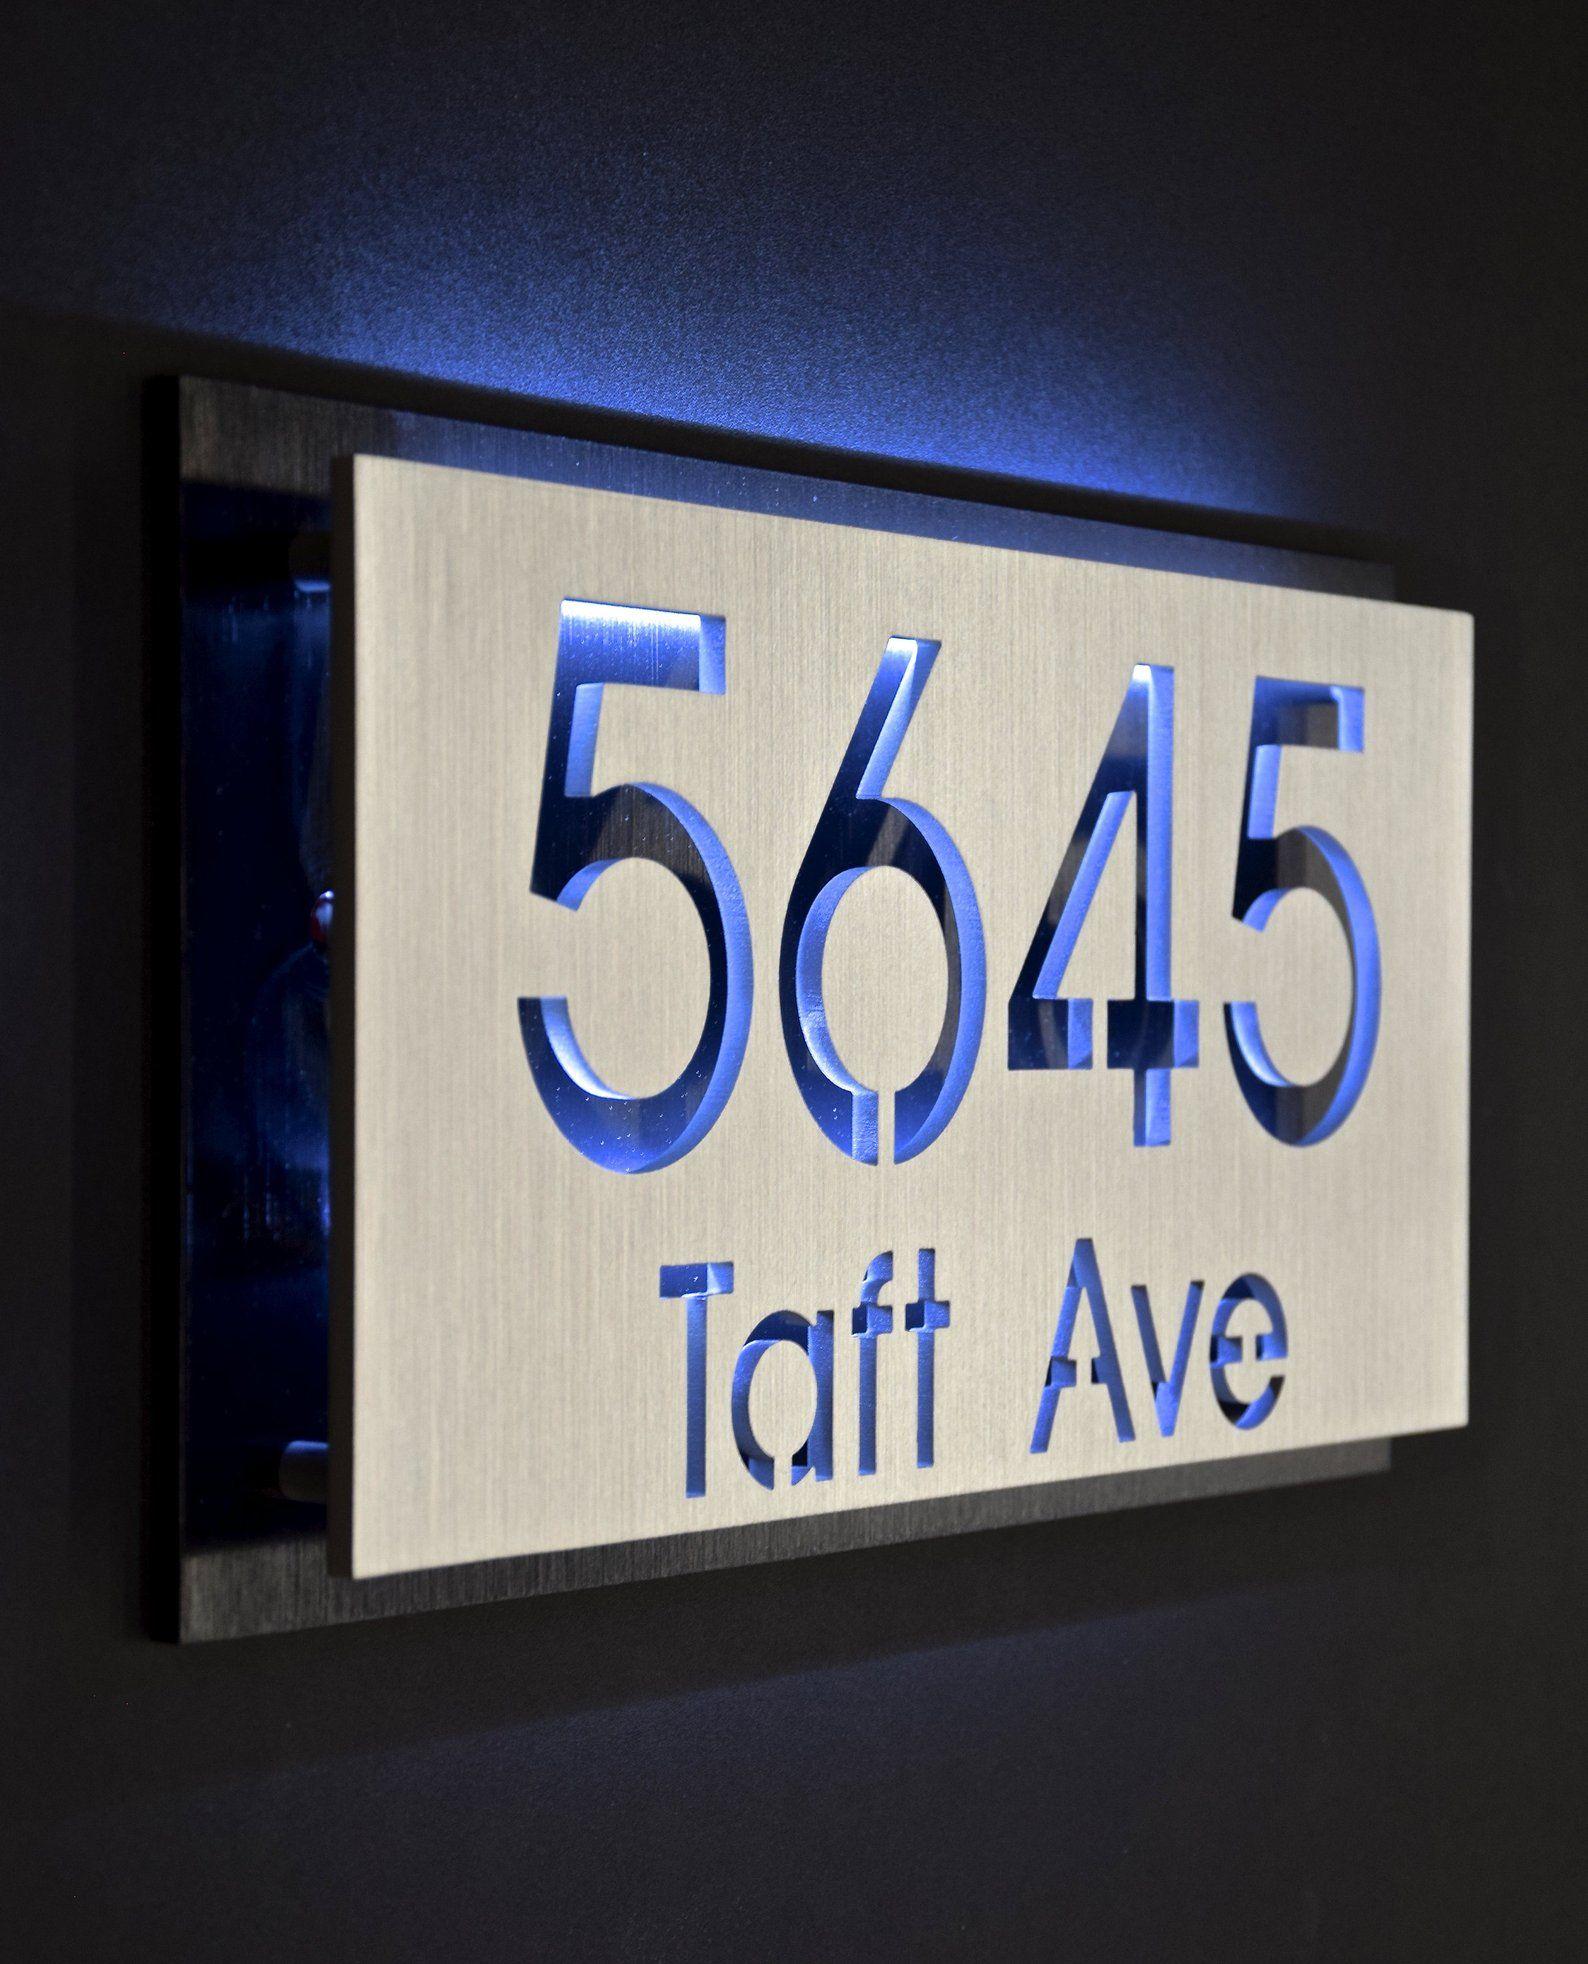 Custom Led Backlit Aluminum Address Plaque Etsy House Numbers